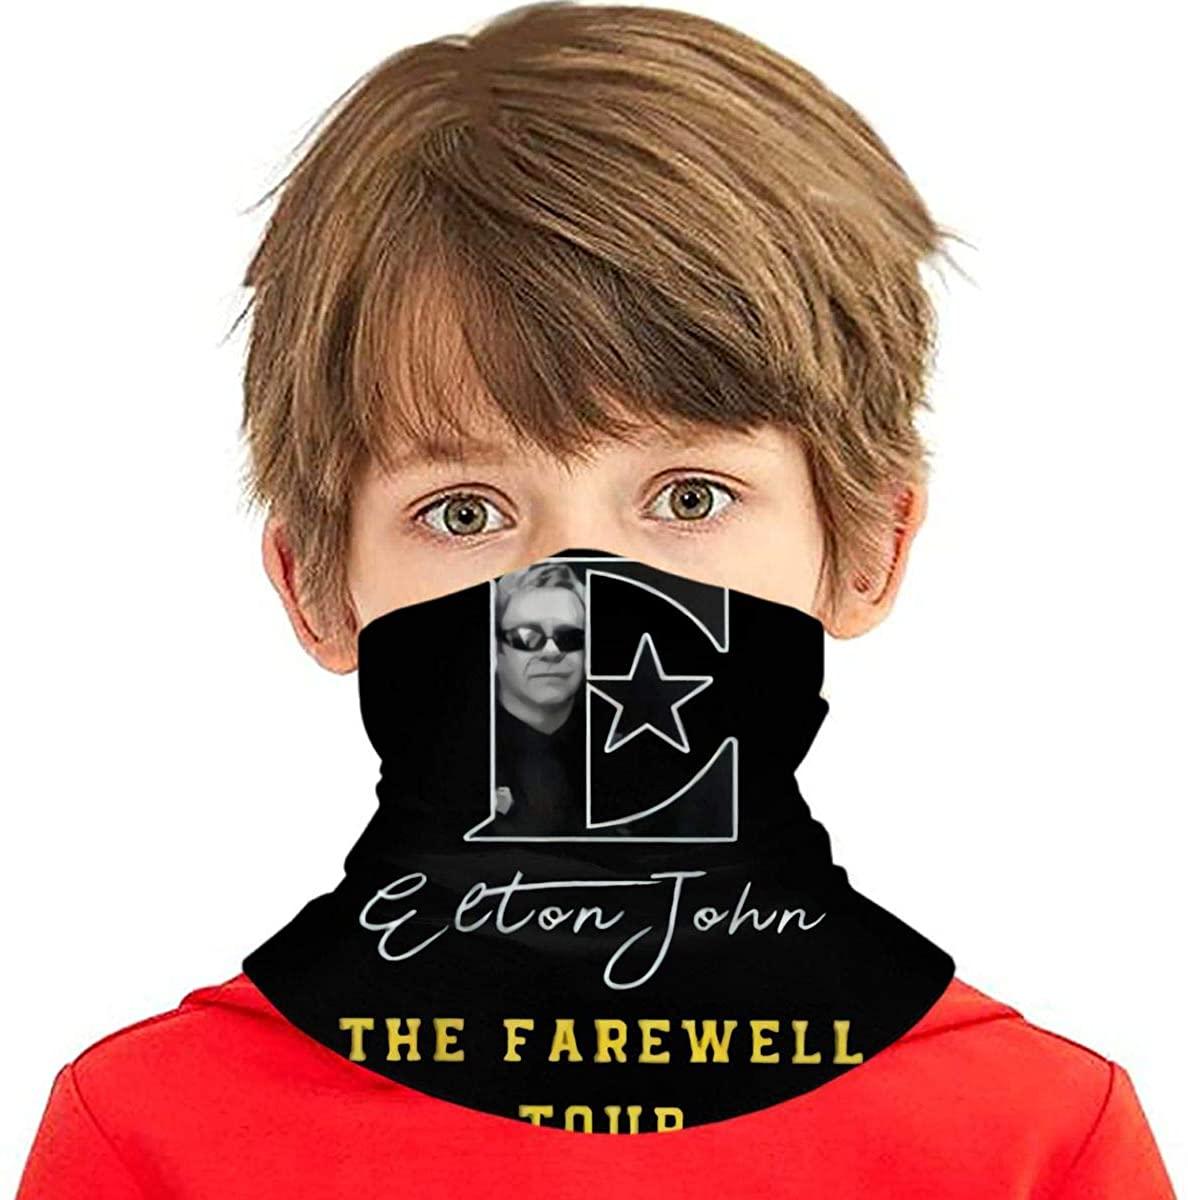 Elton John The Farewell Summer Tour 2019 Fashion Seamless Face Cover/Headband,Scarf for Boy/Girl Black